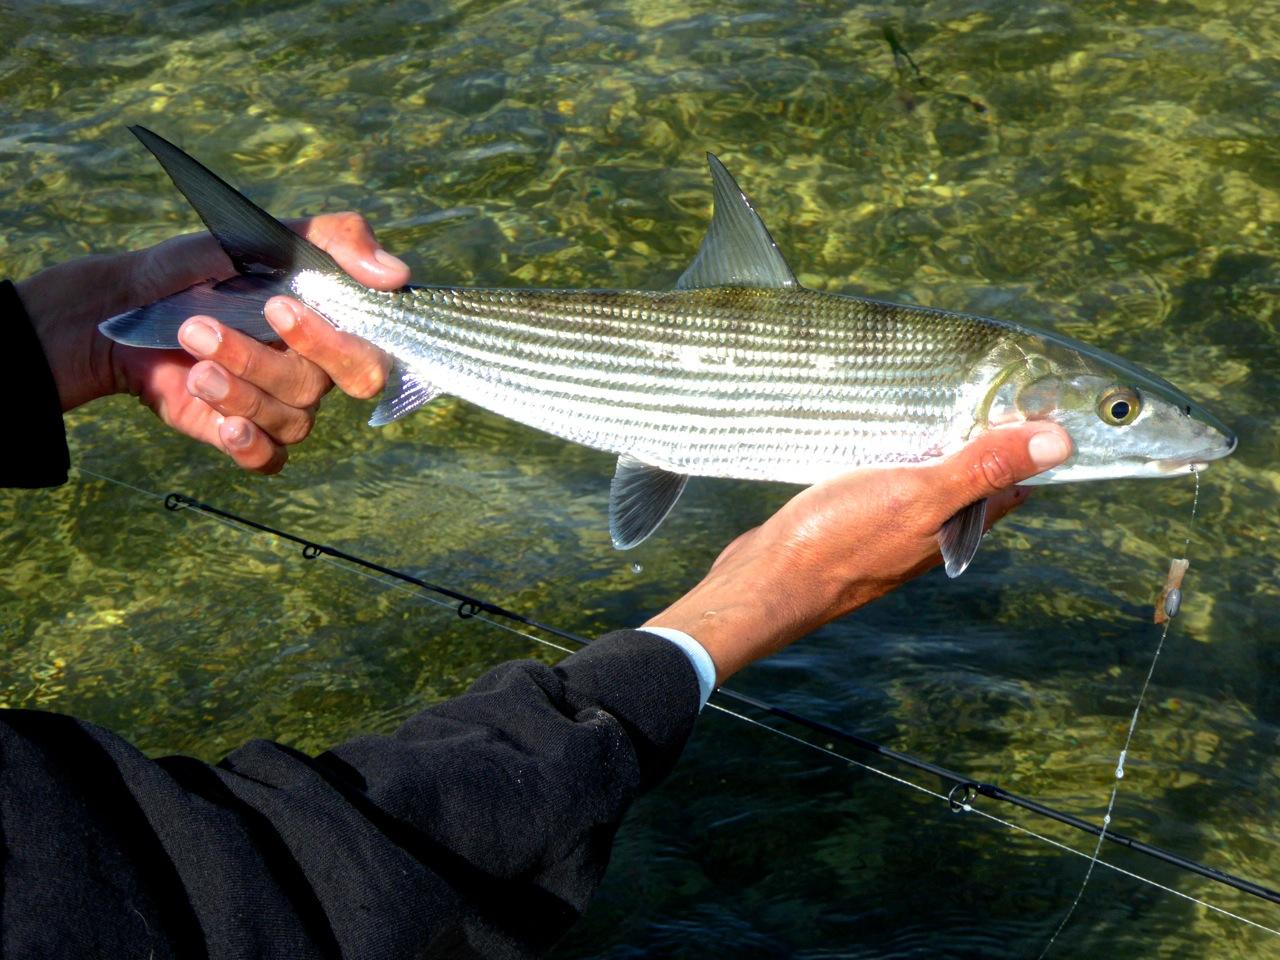 Bonefish ready for release on islamorada flats